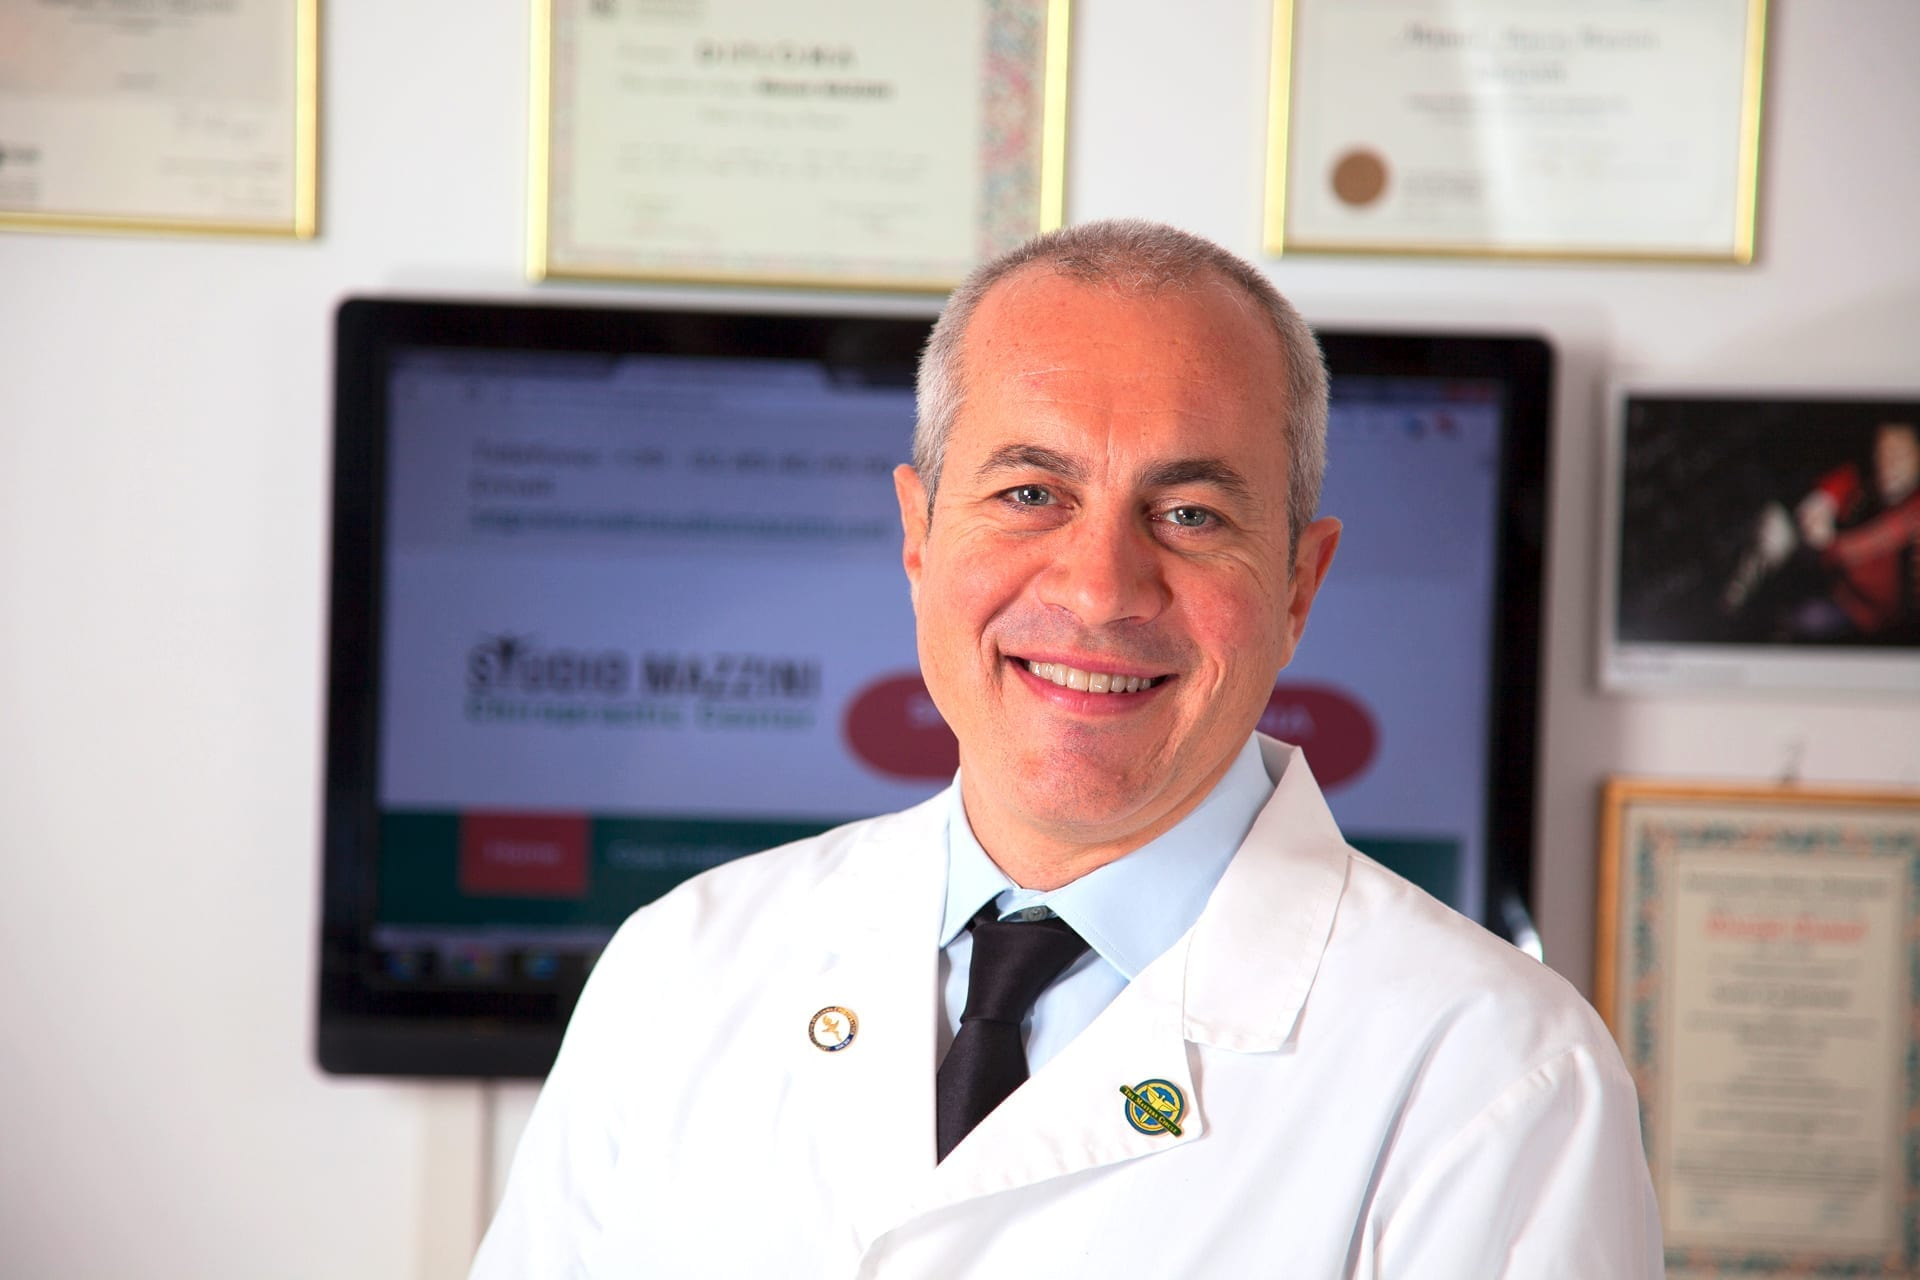 Manuel Marco Mazzini